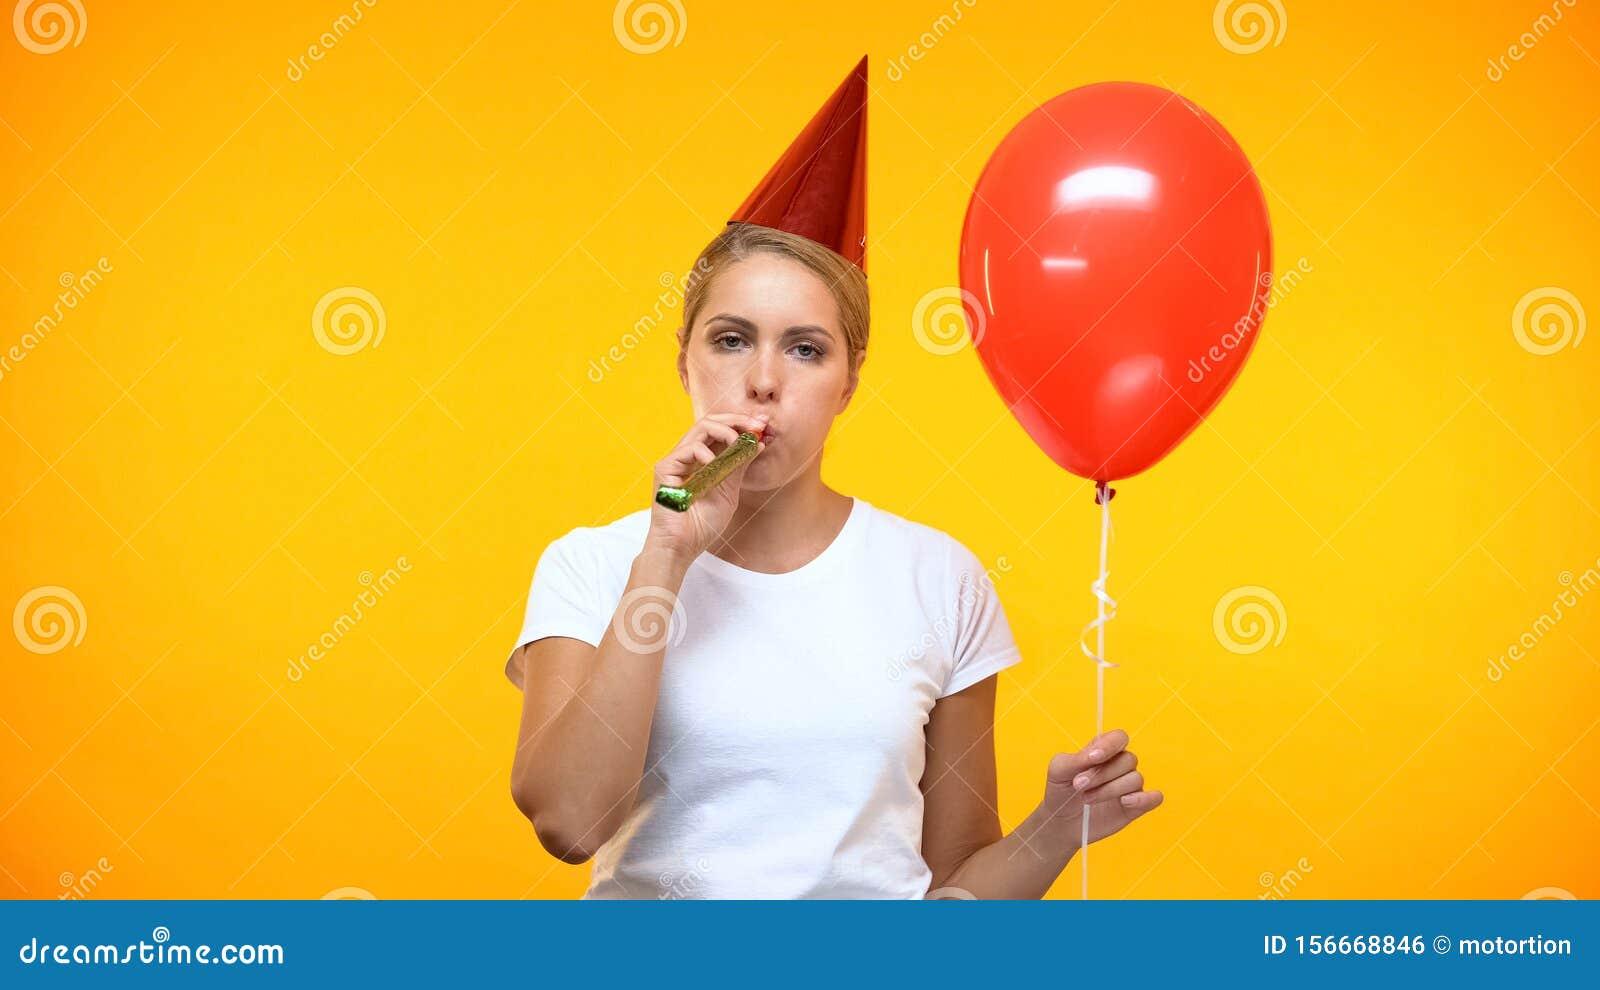 Sad adult woman blowing noisemaker holding balloon, bad mood at birthday party